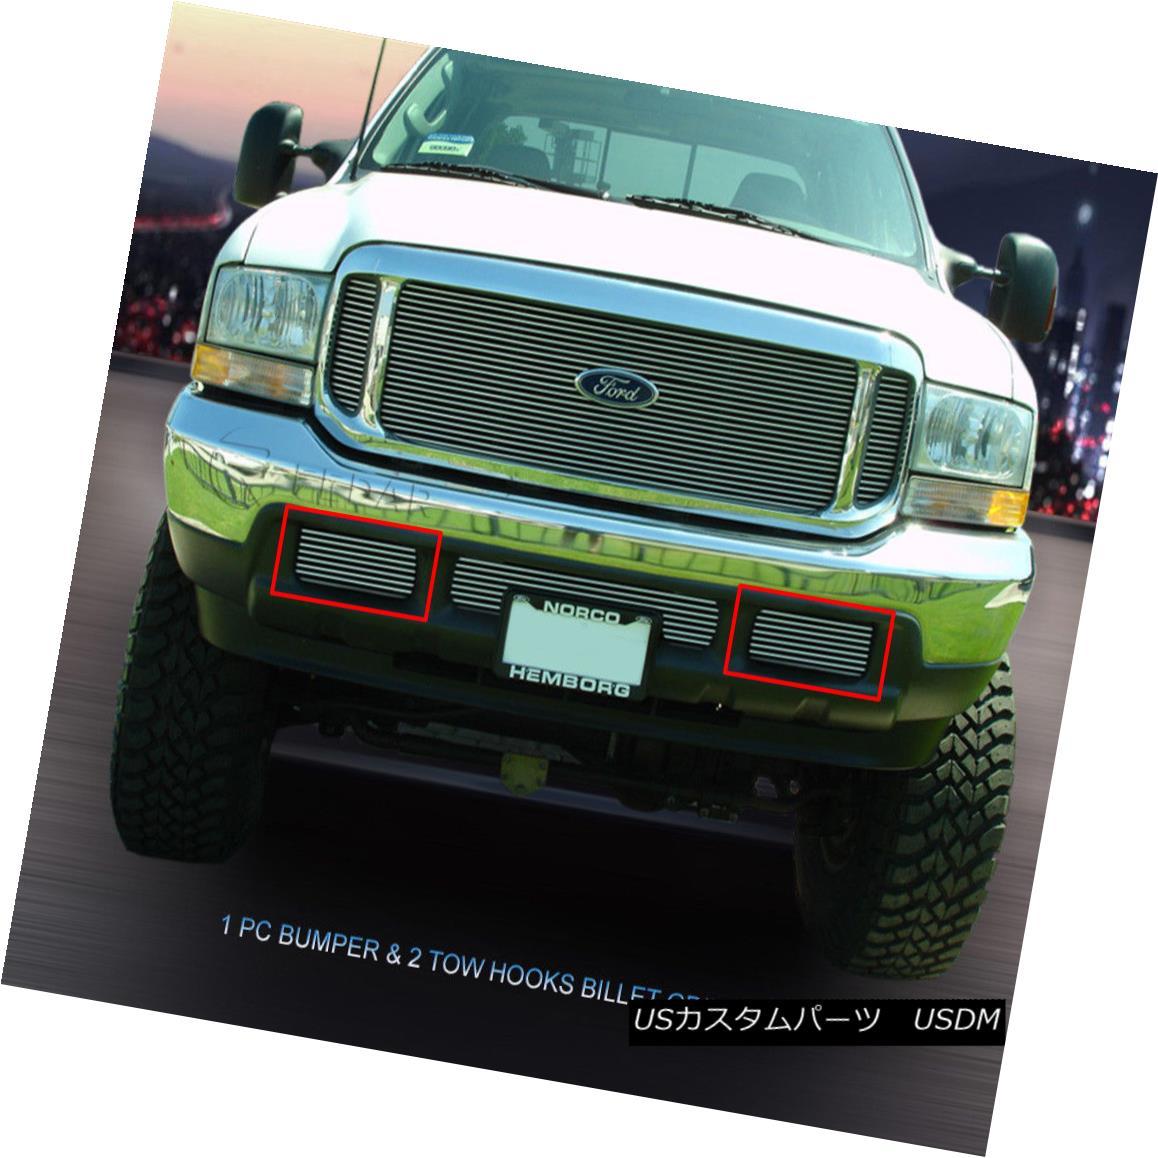 450 F-550牽引フックビレットグリル上部インサートフェルダー Hook Upper Grille 99-04フォードF-250 / Ford F-350 / Tow Insert F-250/F-350/F-450/F-550 Billet 99-04 グリル / F- Fedar